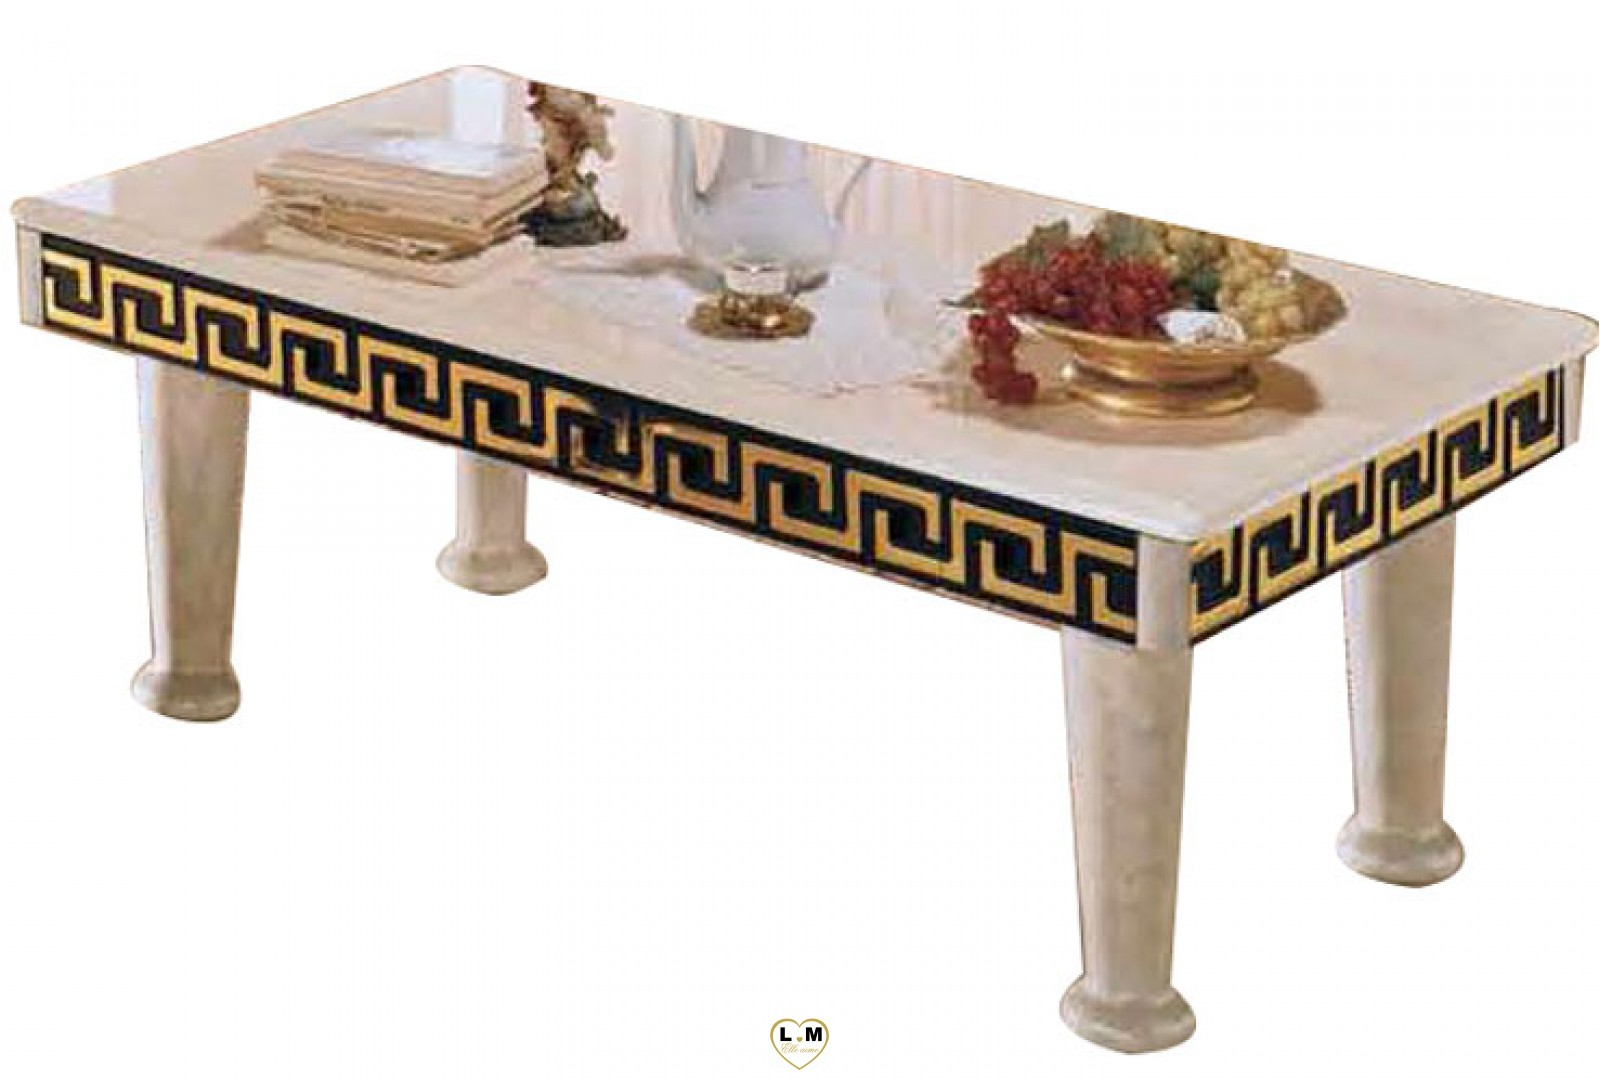 royal-laque-ivoire-doree-ensemble-salle-a-manger-table-basse -1600x1080-product_popup.jpg